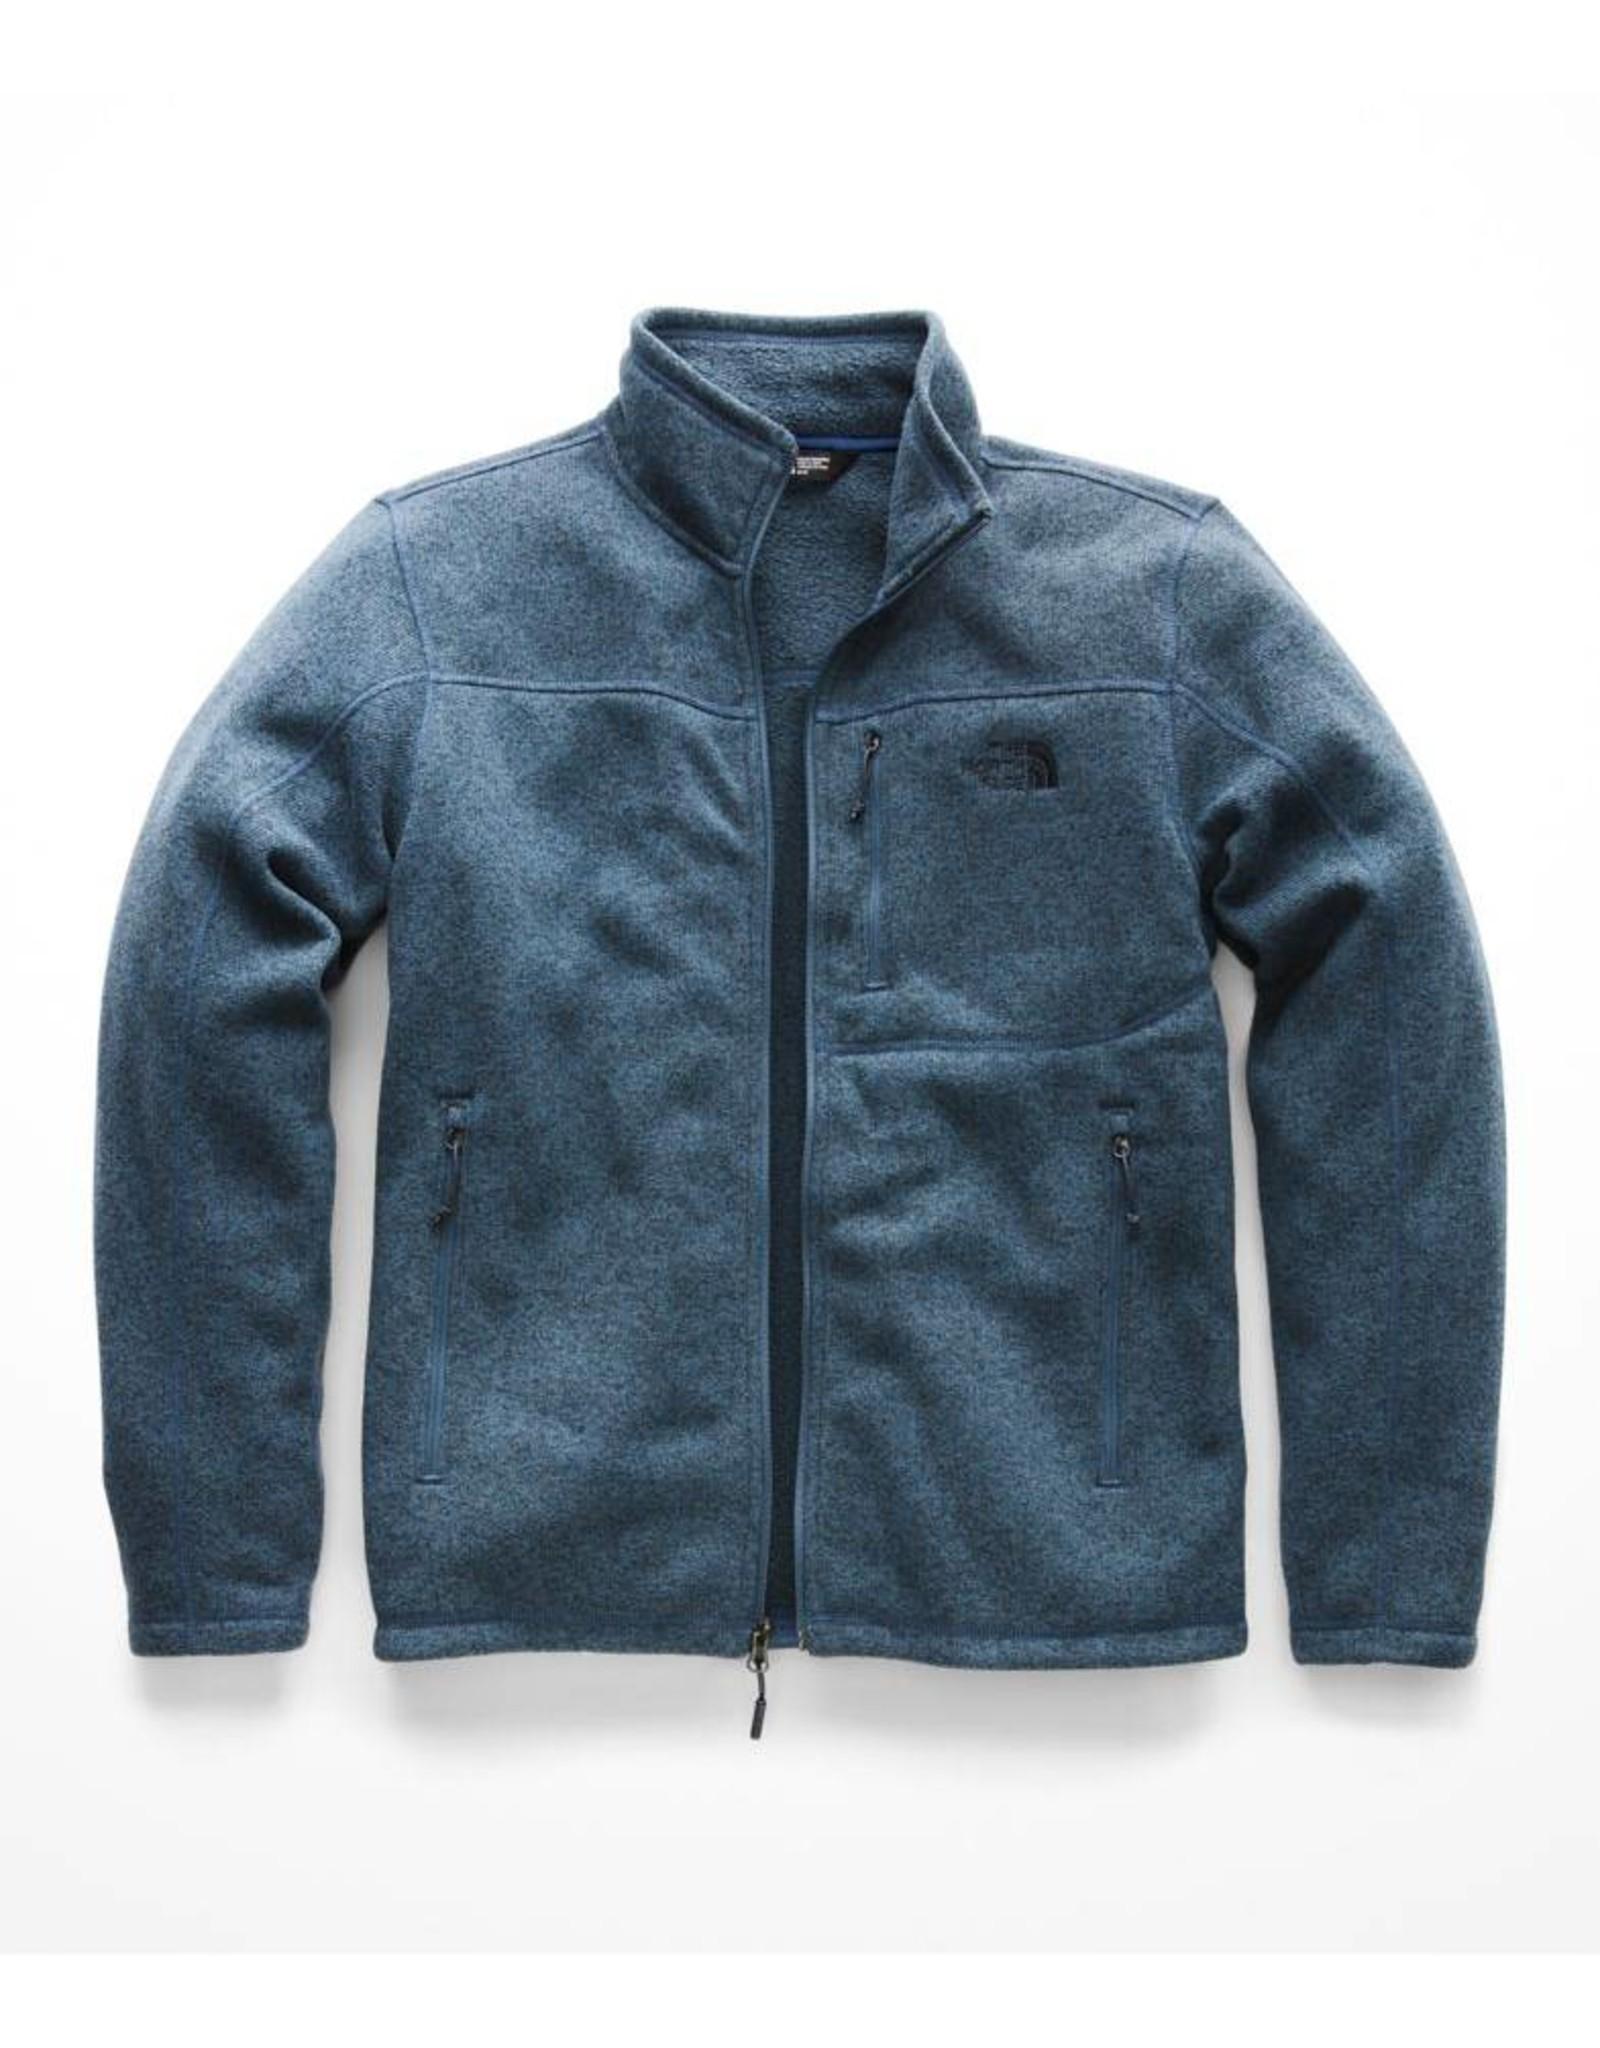 The North Face The North Face Men's Gordon Lyons Fleece Jacket